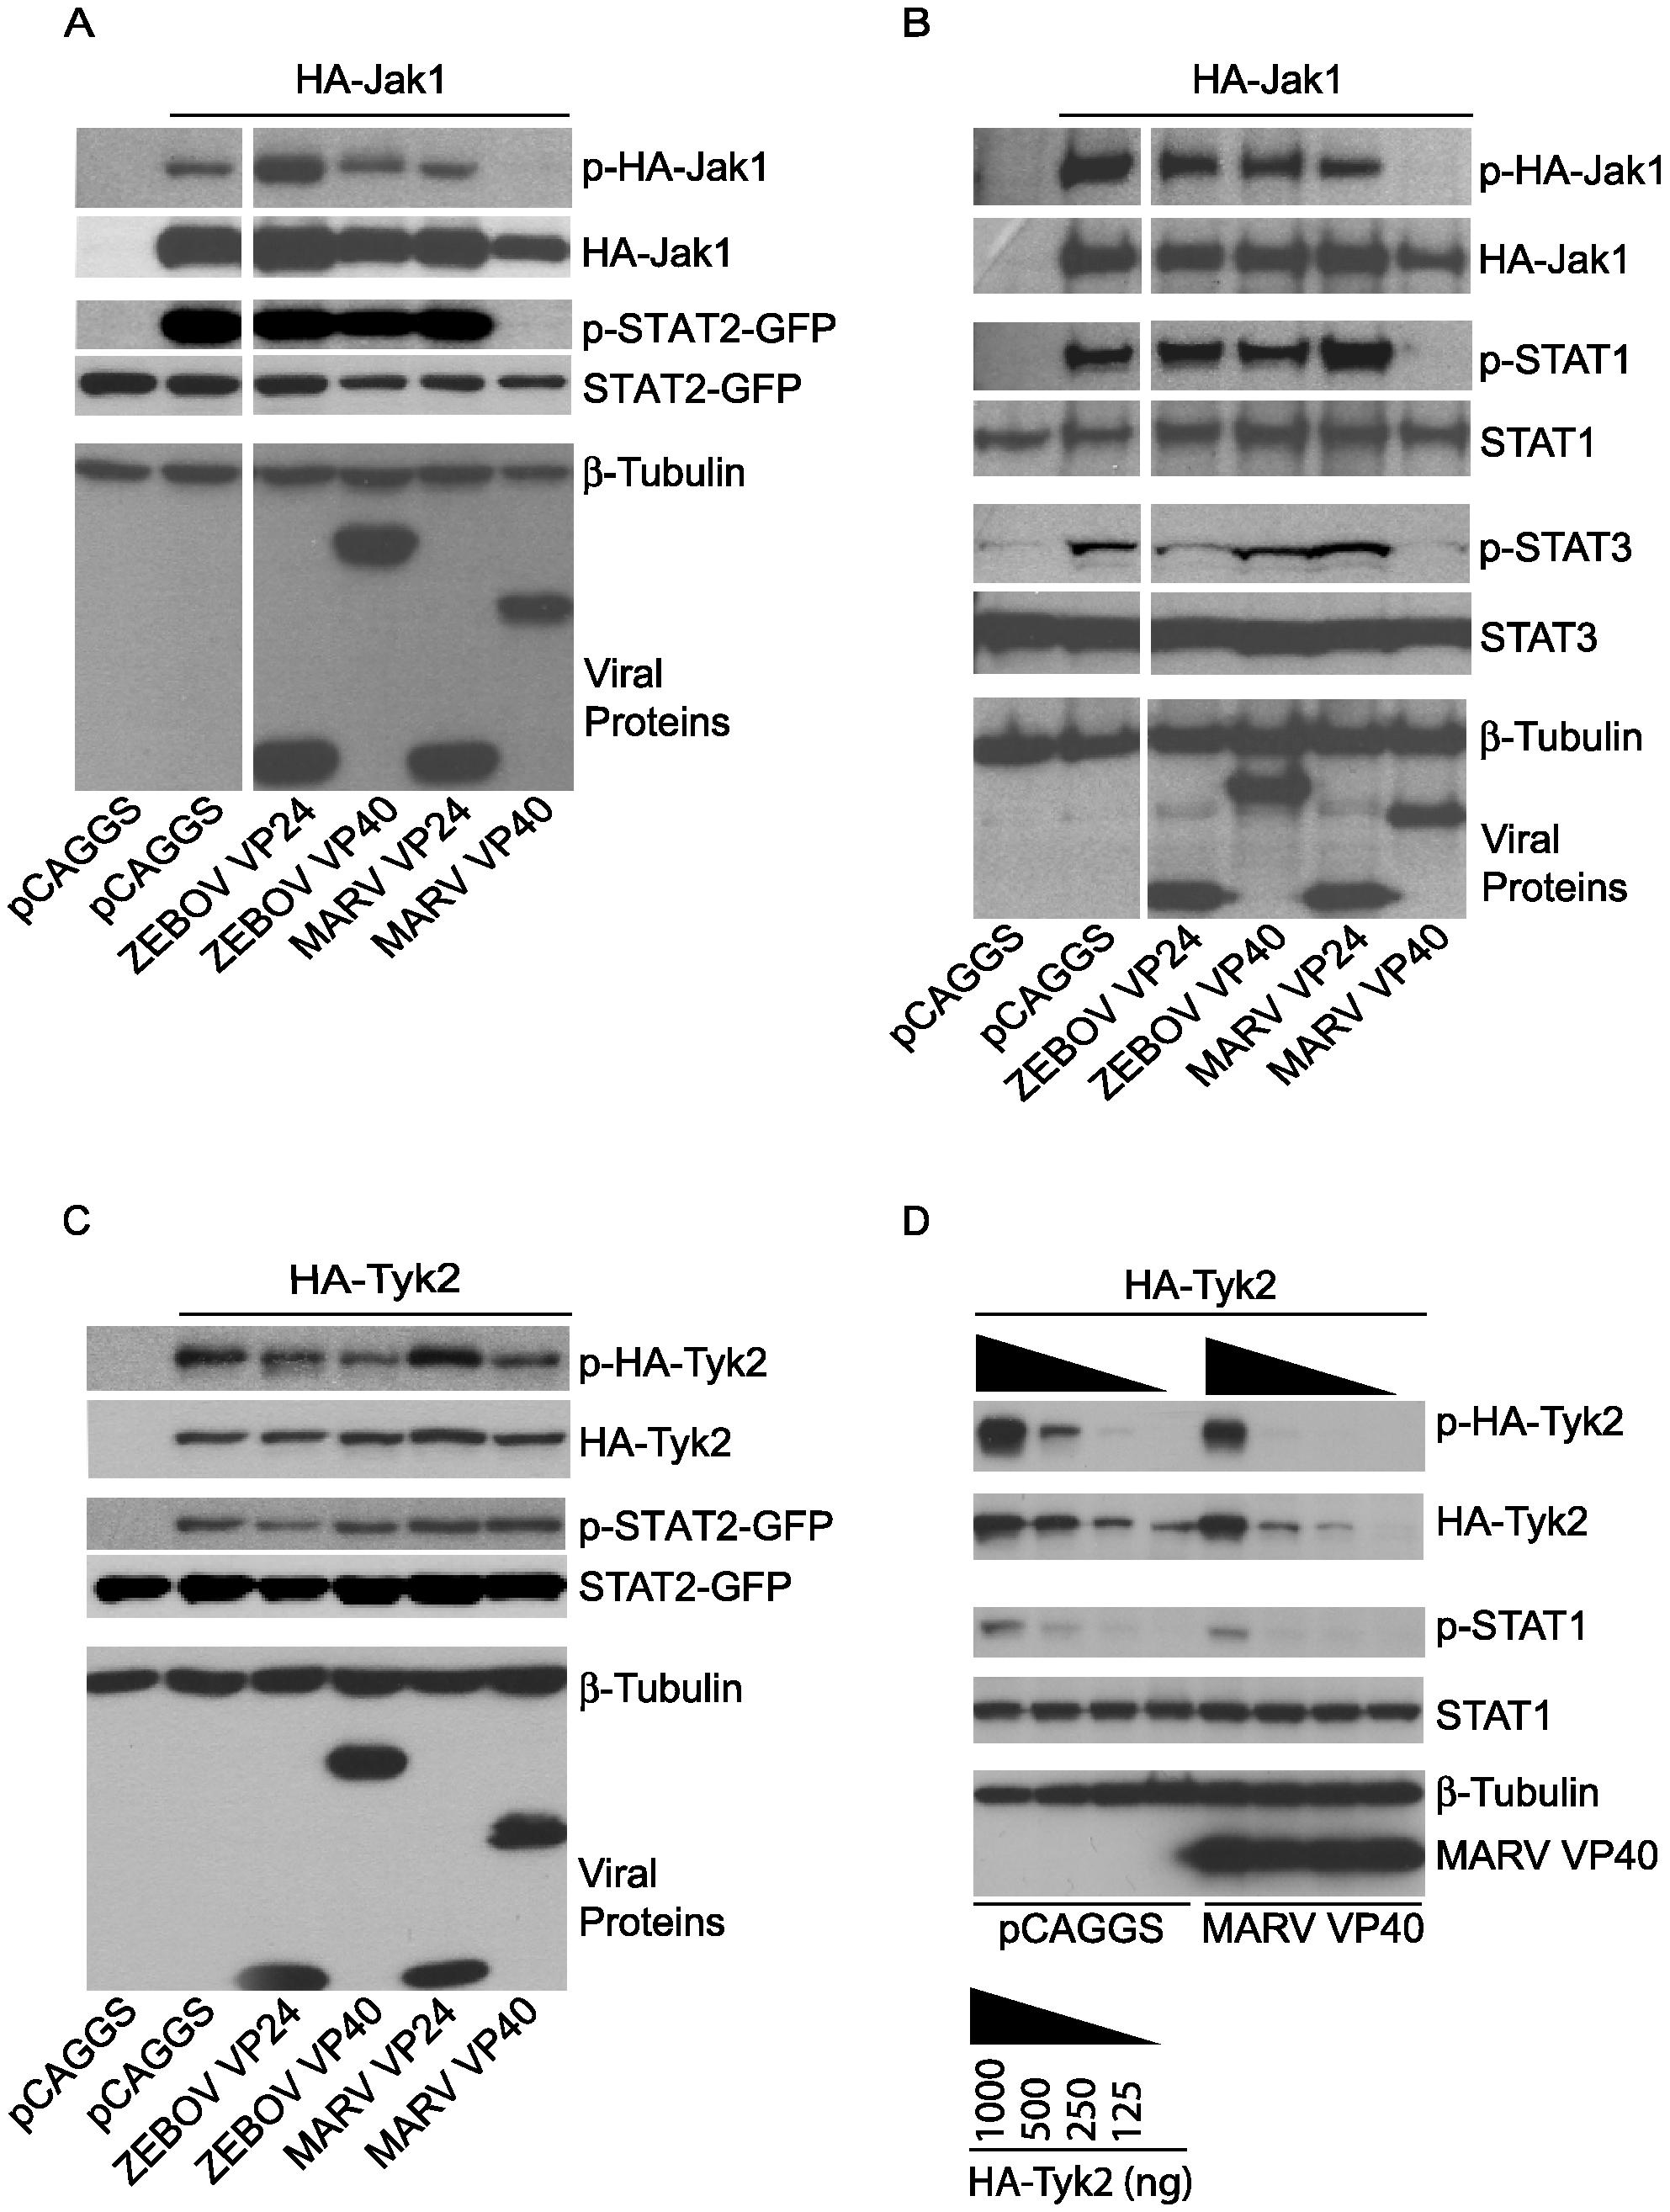 Jak1 phosphorylation is inhibited by MARV VP40.